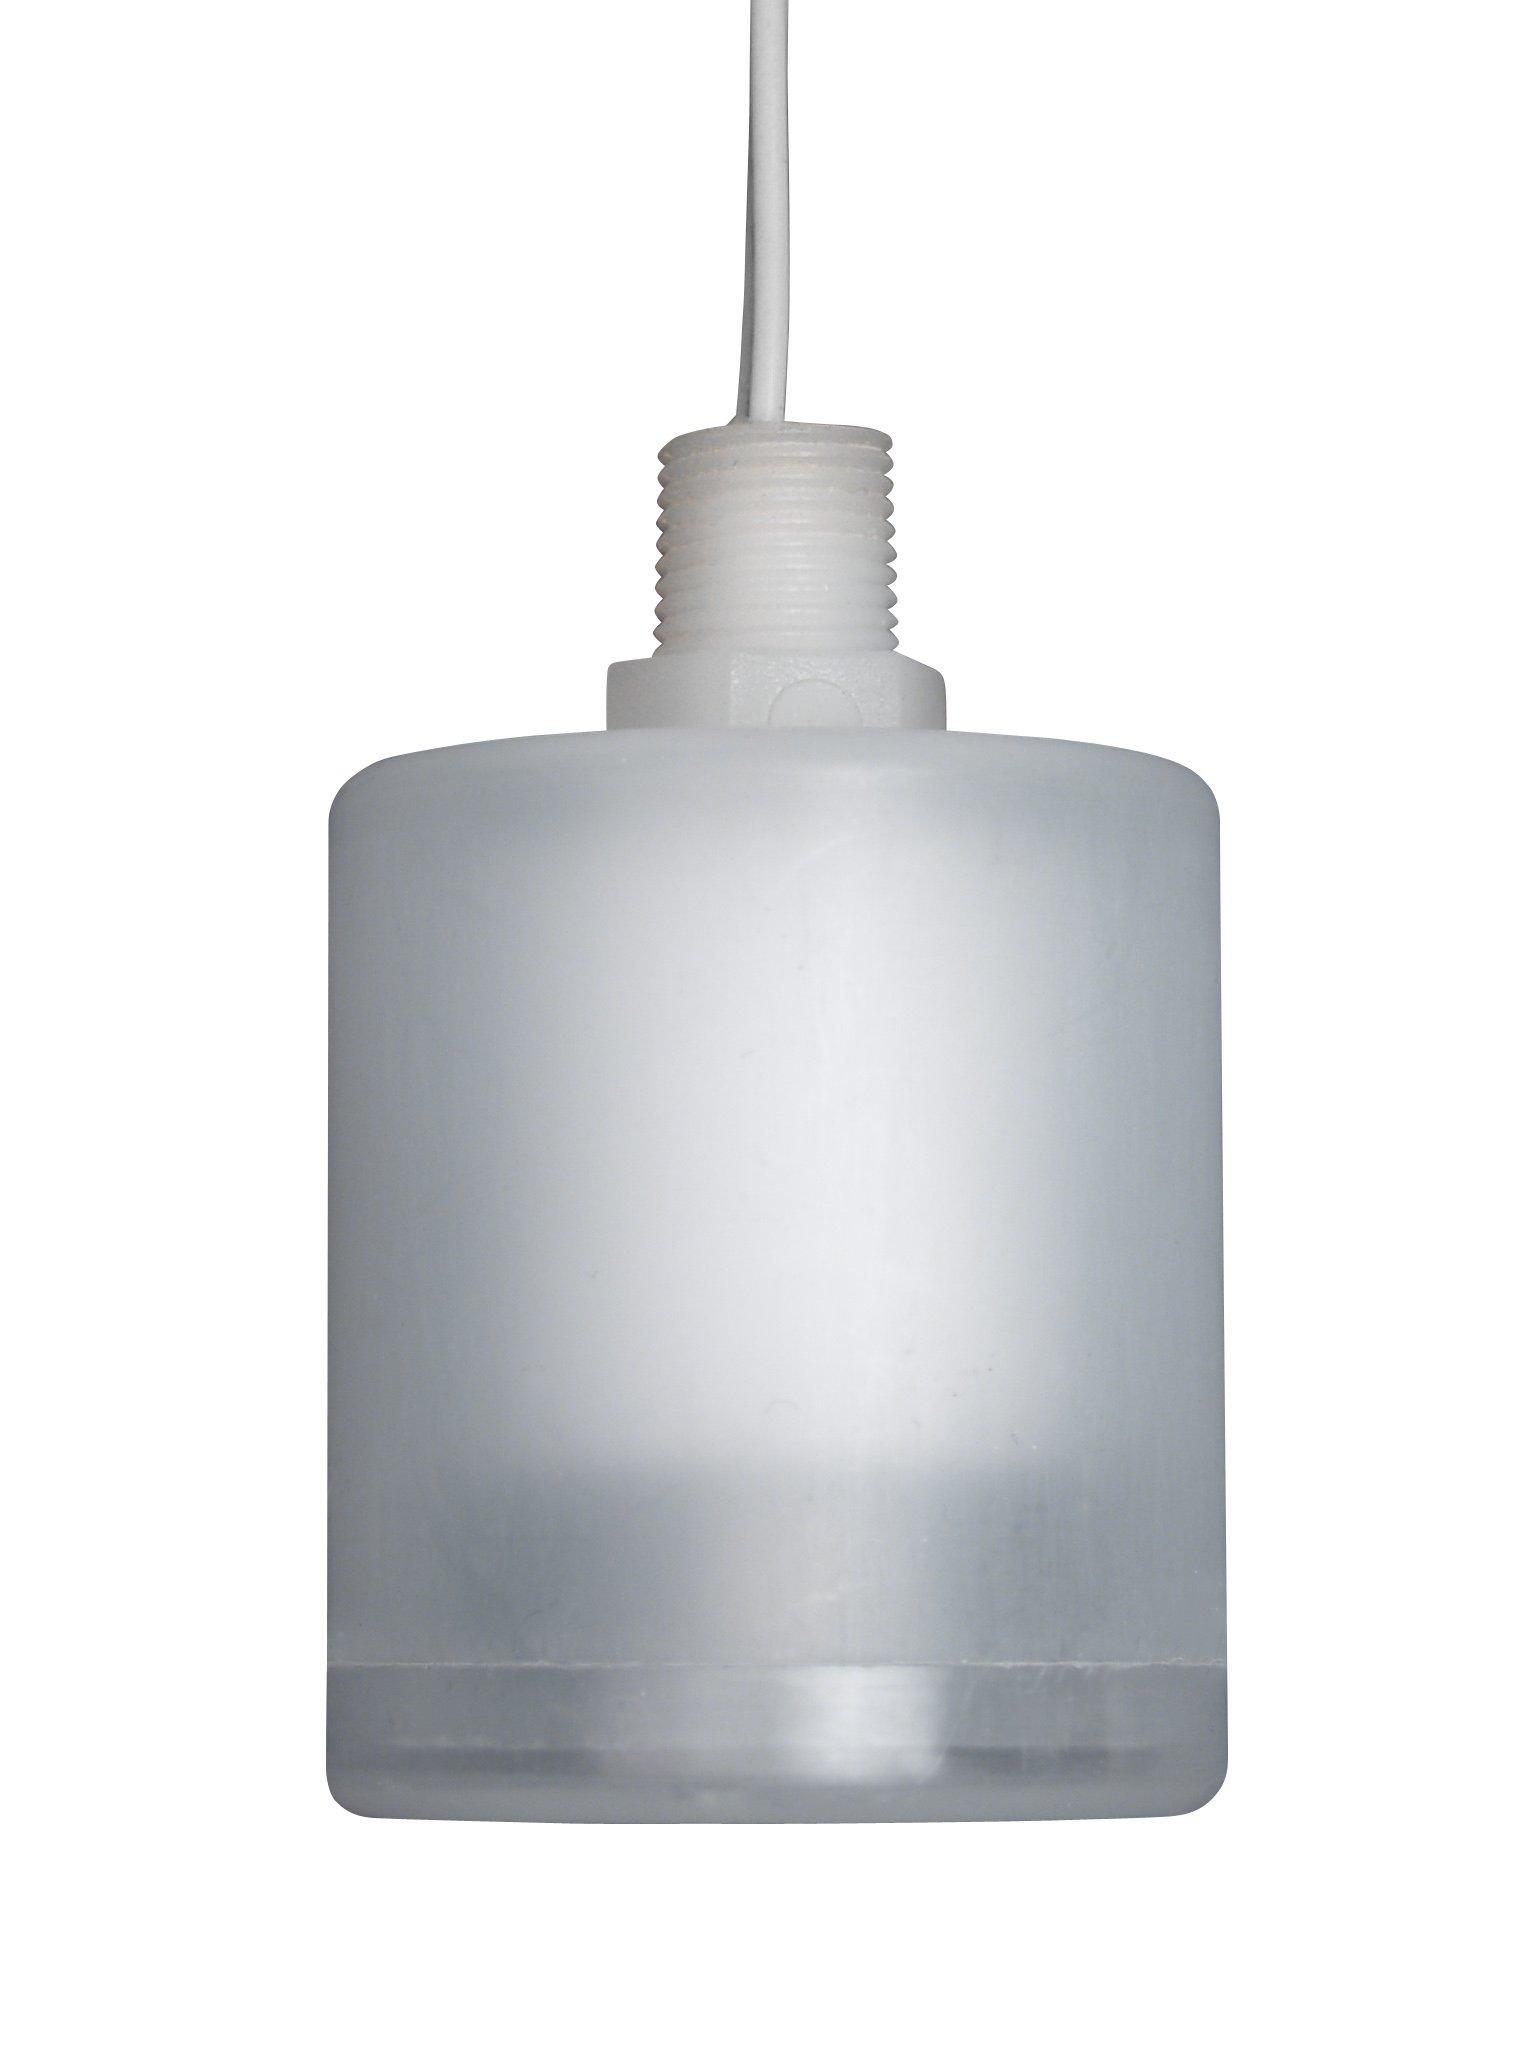 Madison MS8000 Plastic Miniature Liquid Level Switch with Slosh Shield, 30 VA SPST, 1/8 NPT Male, 100 psig Pressure